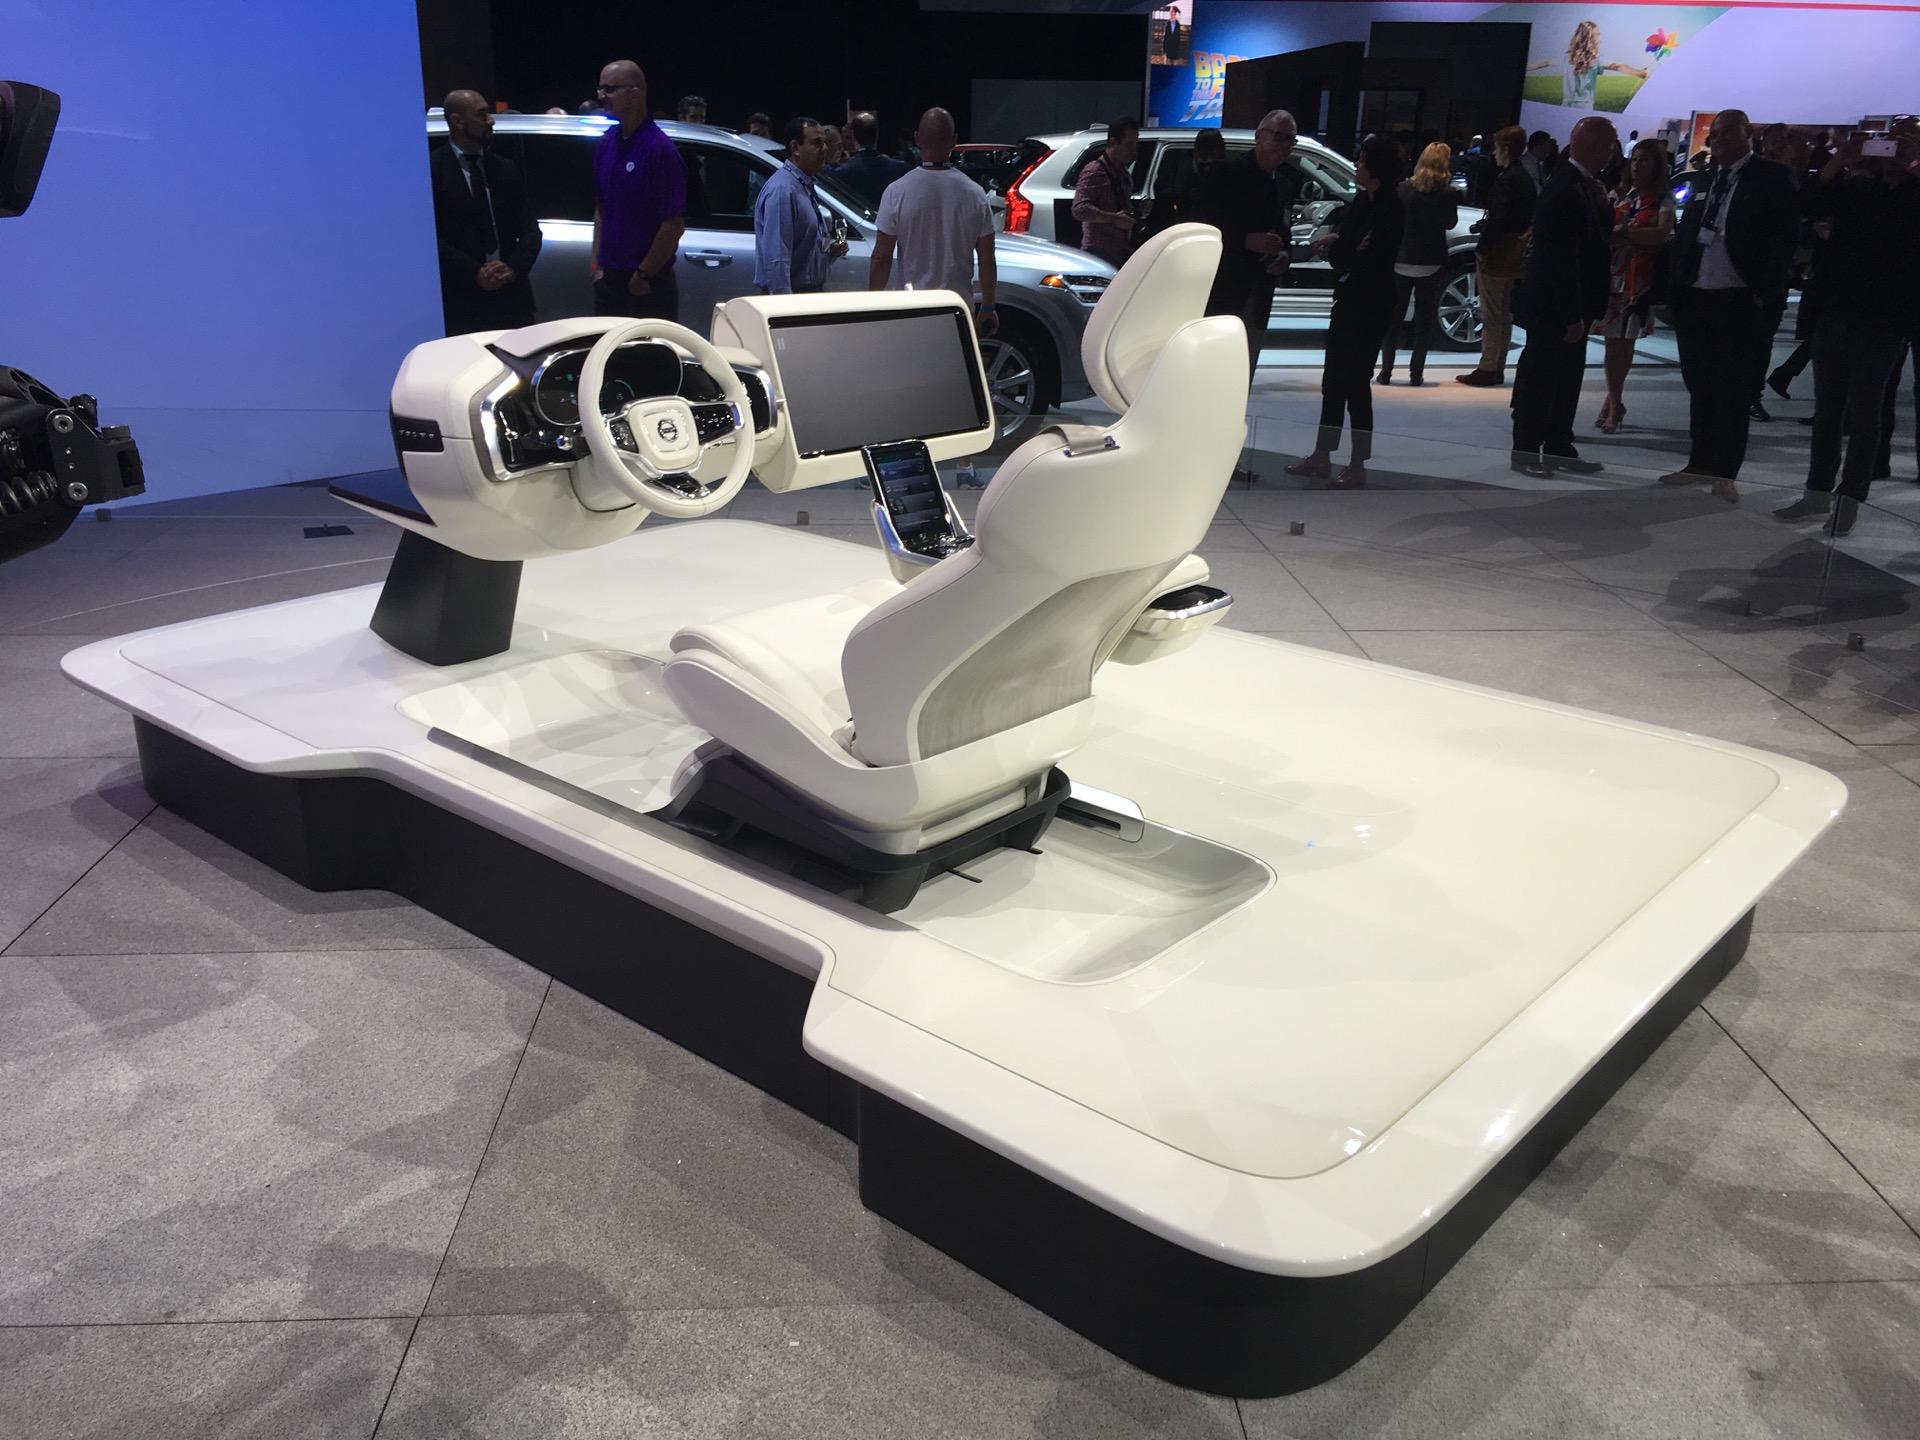 Volvo Concept 26 Hints At Interior Design In A World Of Autonomous Cars